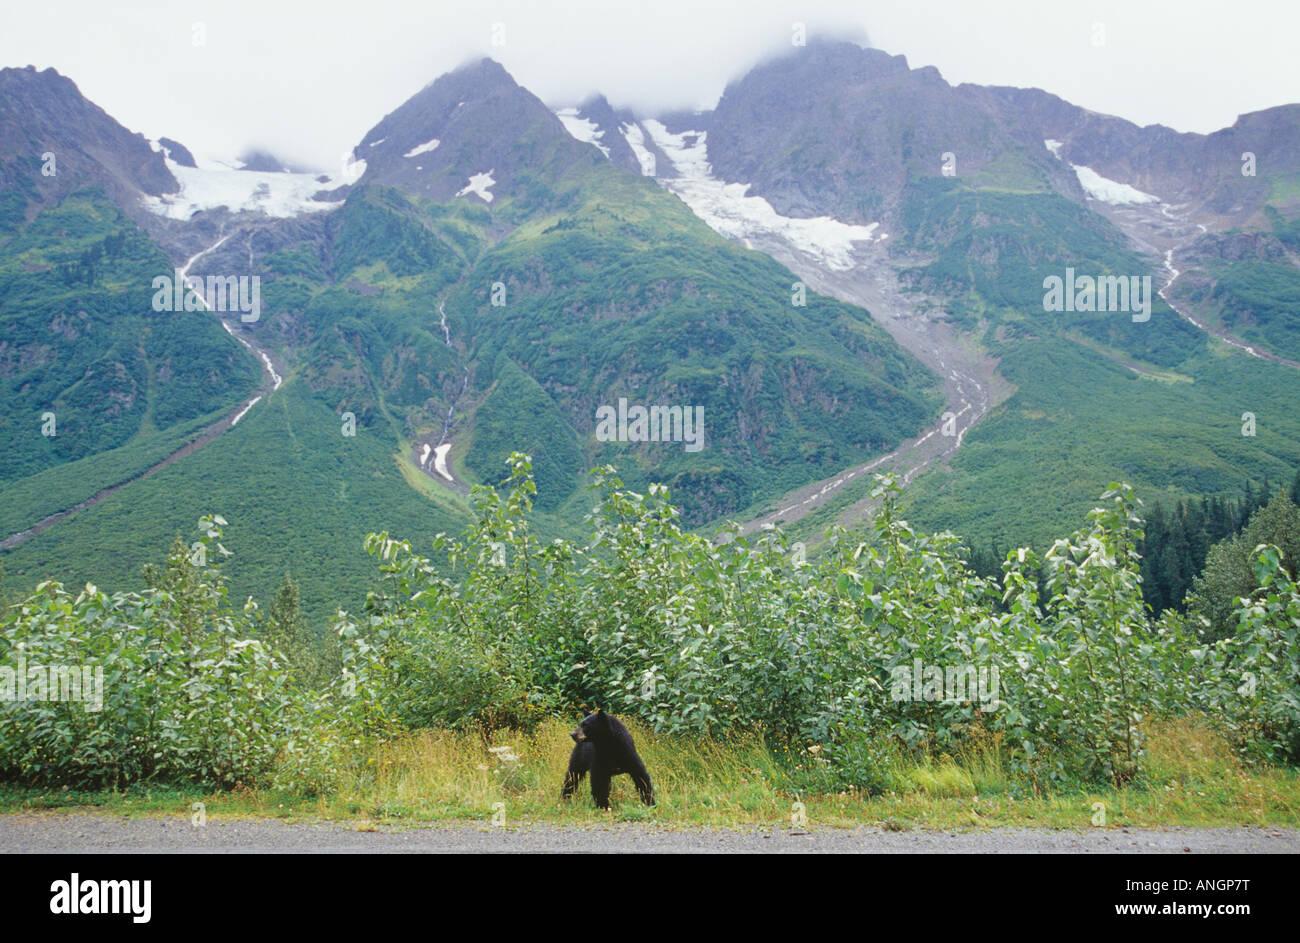 Black bear and Glaciers near Stewart, British Columbia, Canada. - Stock Image